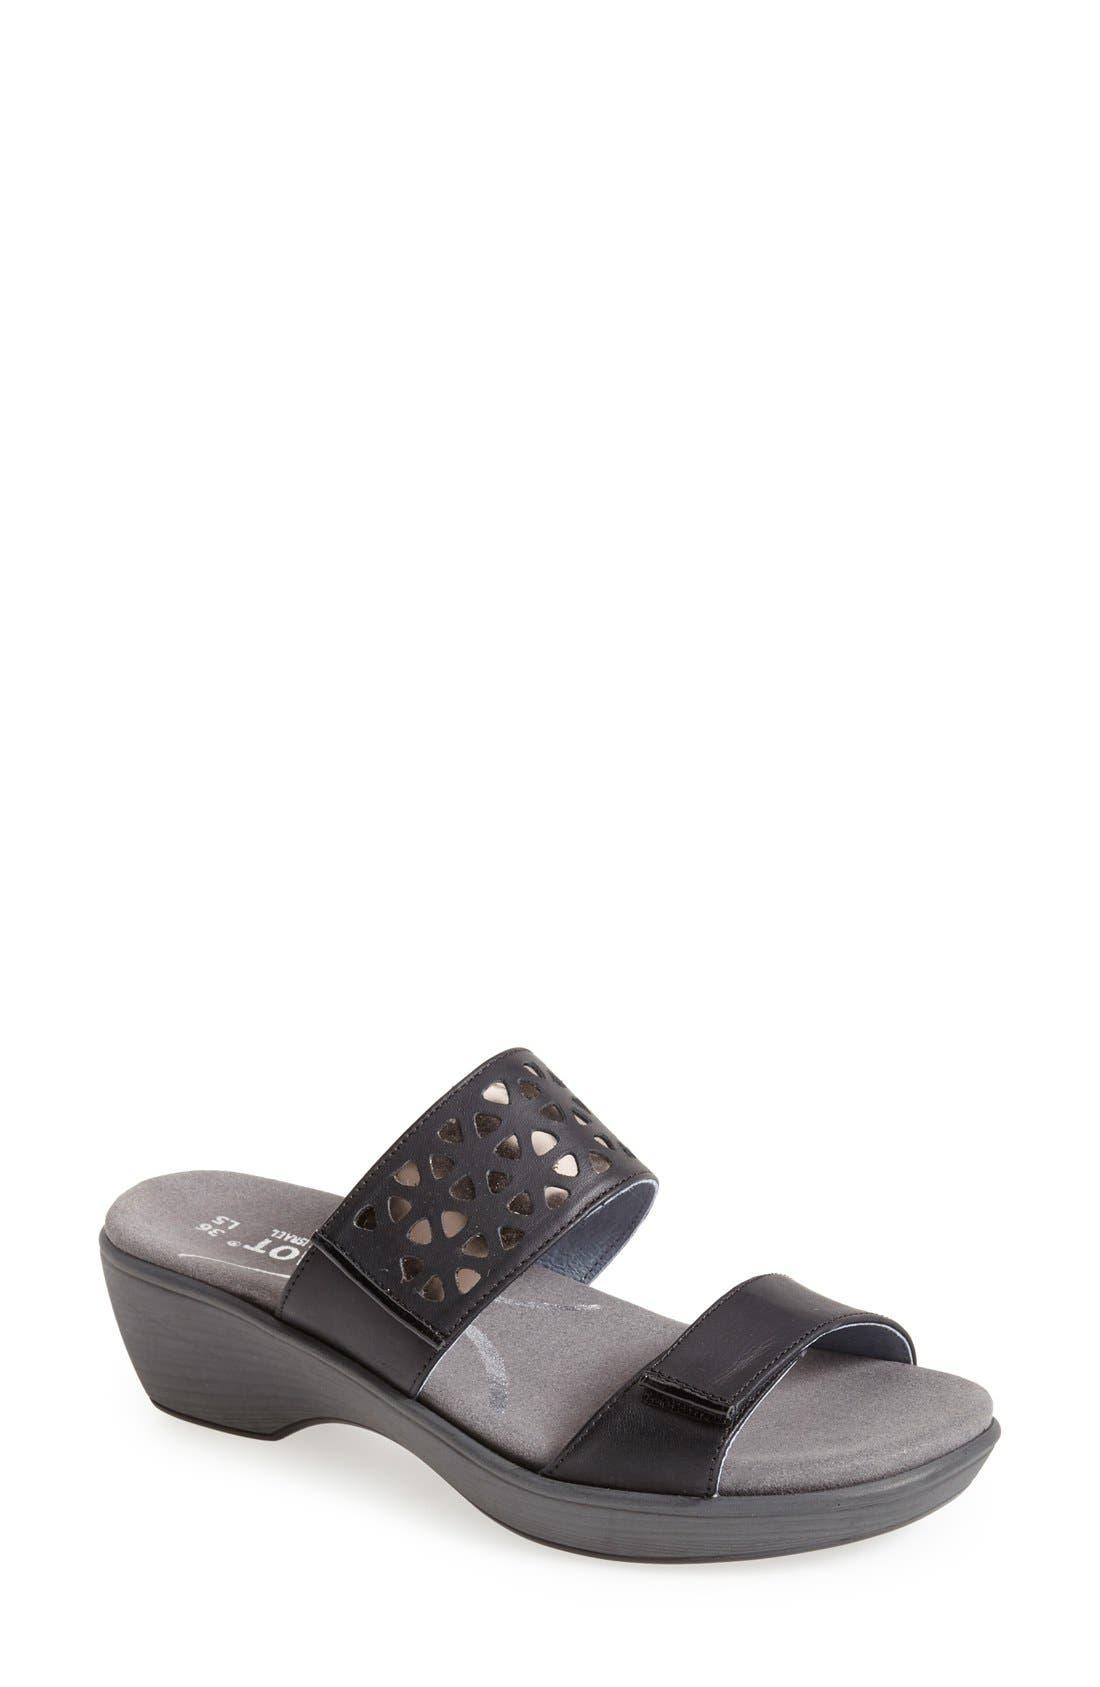 NAOT 'Moreto' Wedge Sandal